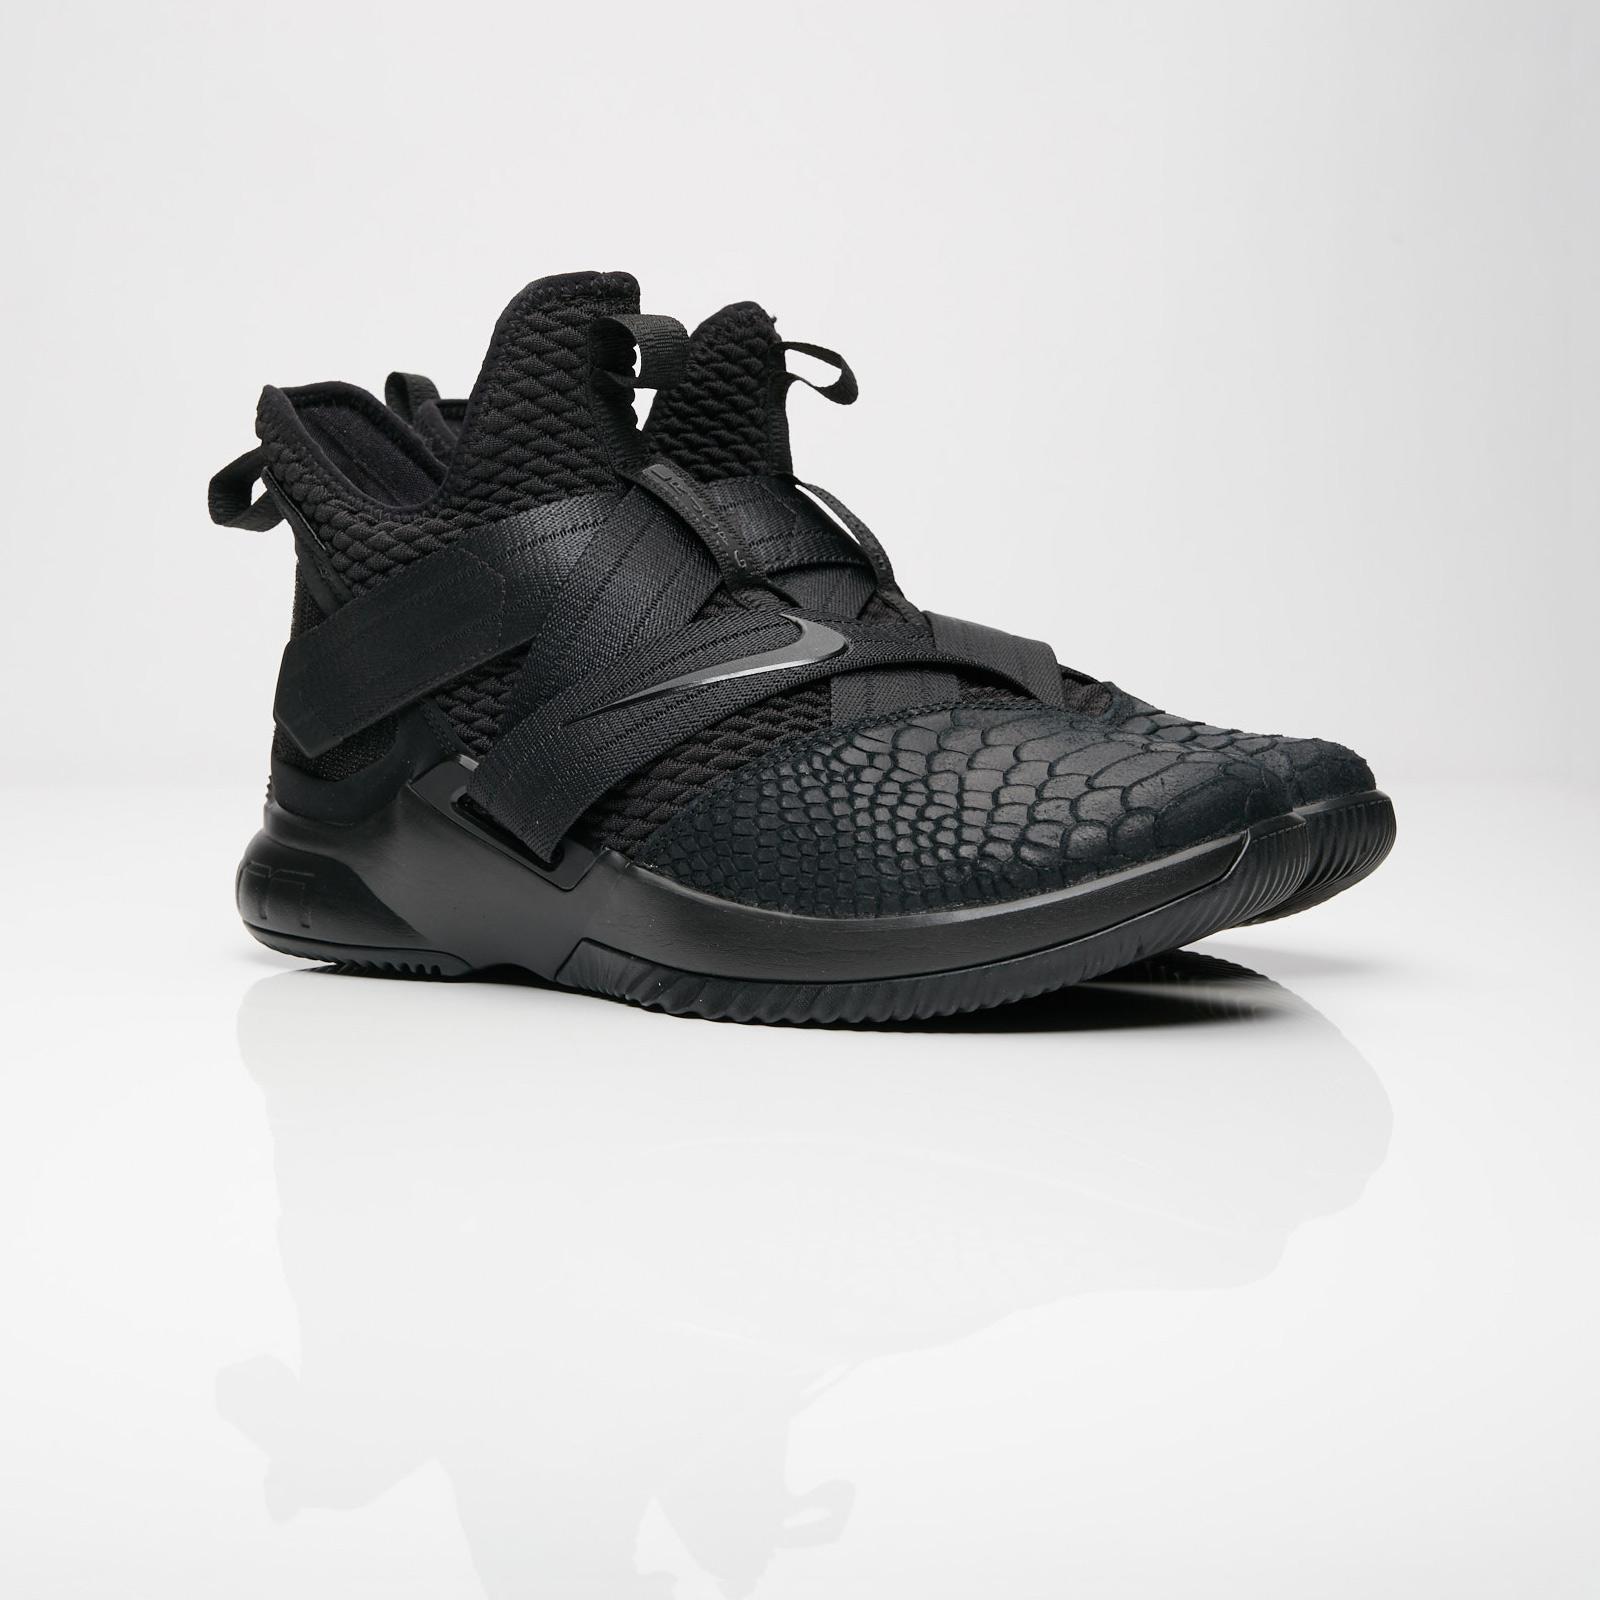 Nike Lebron Soldier XII SFG - Ao4054